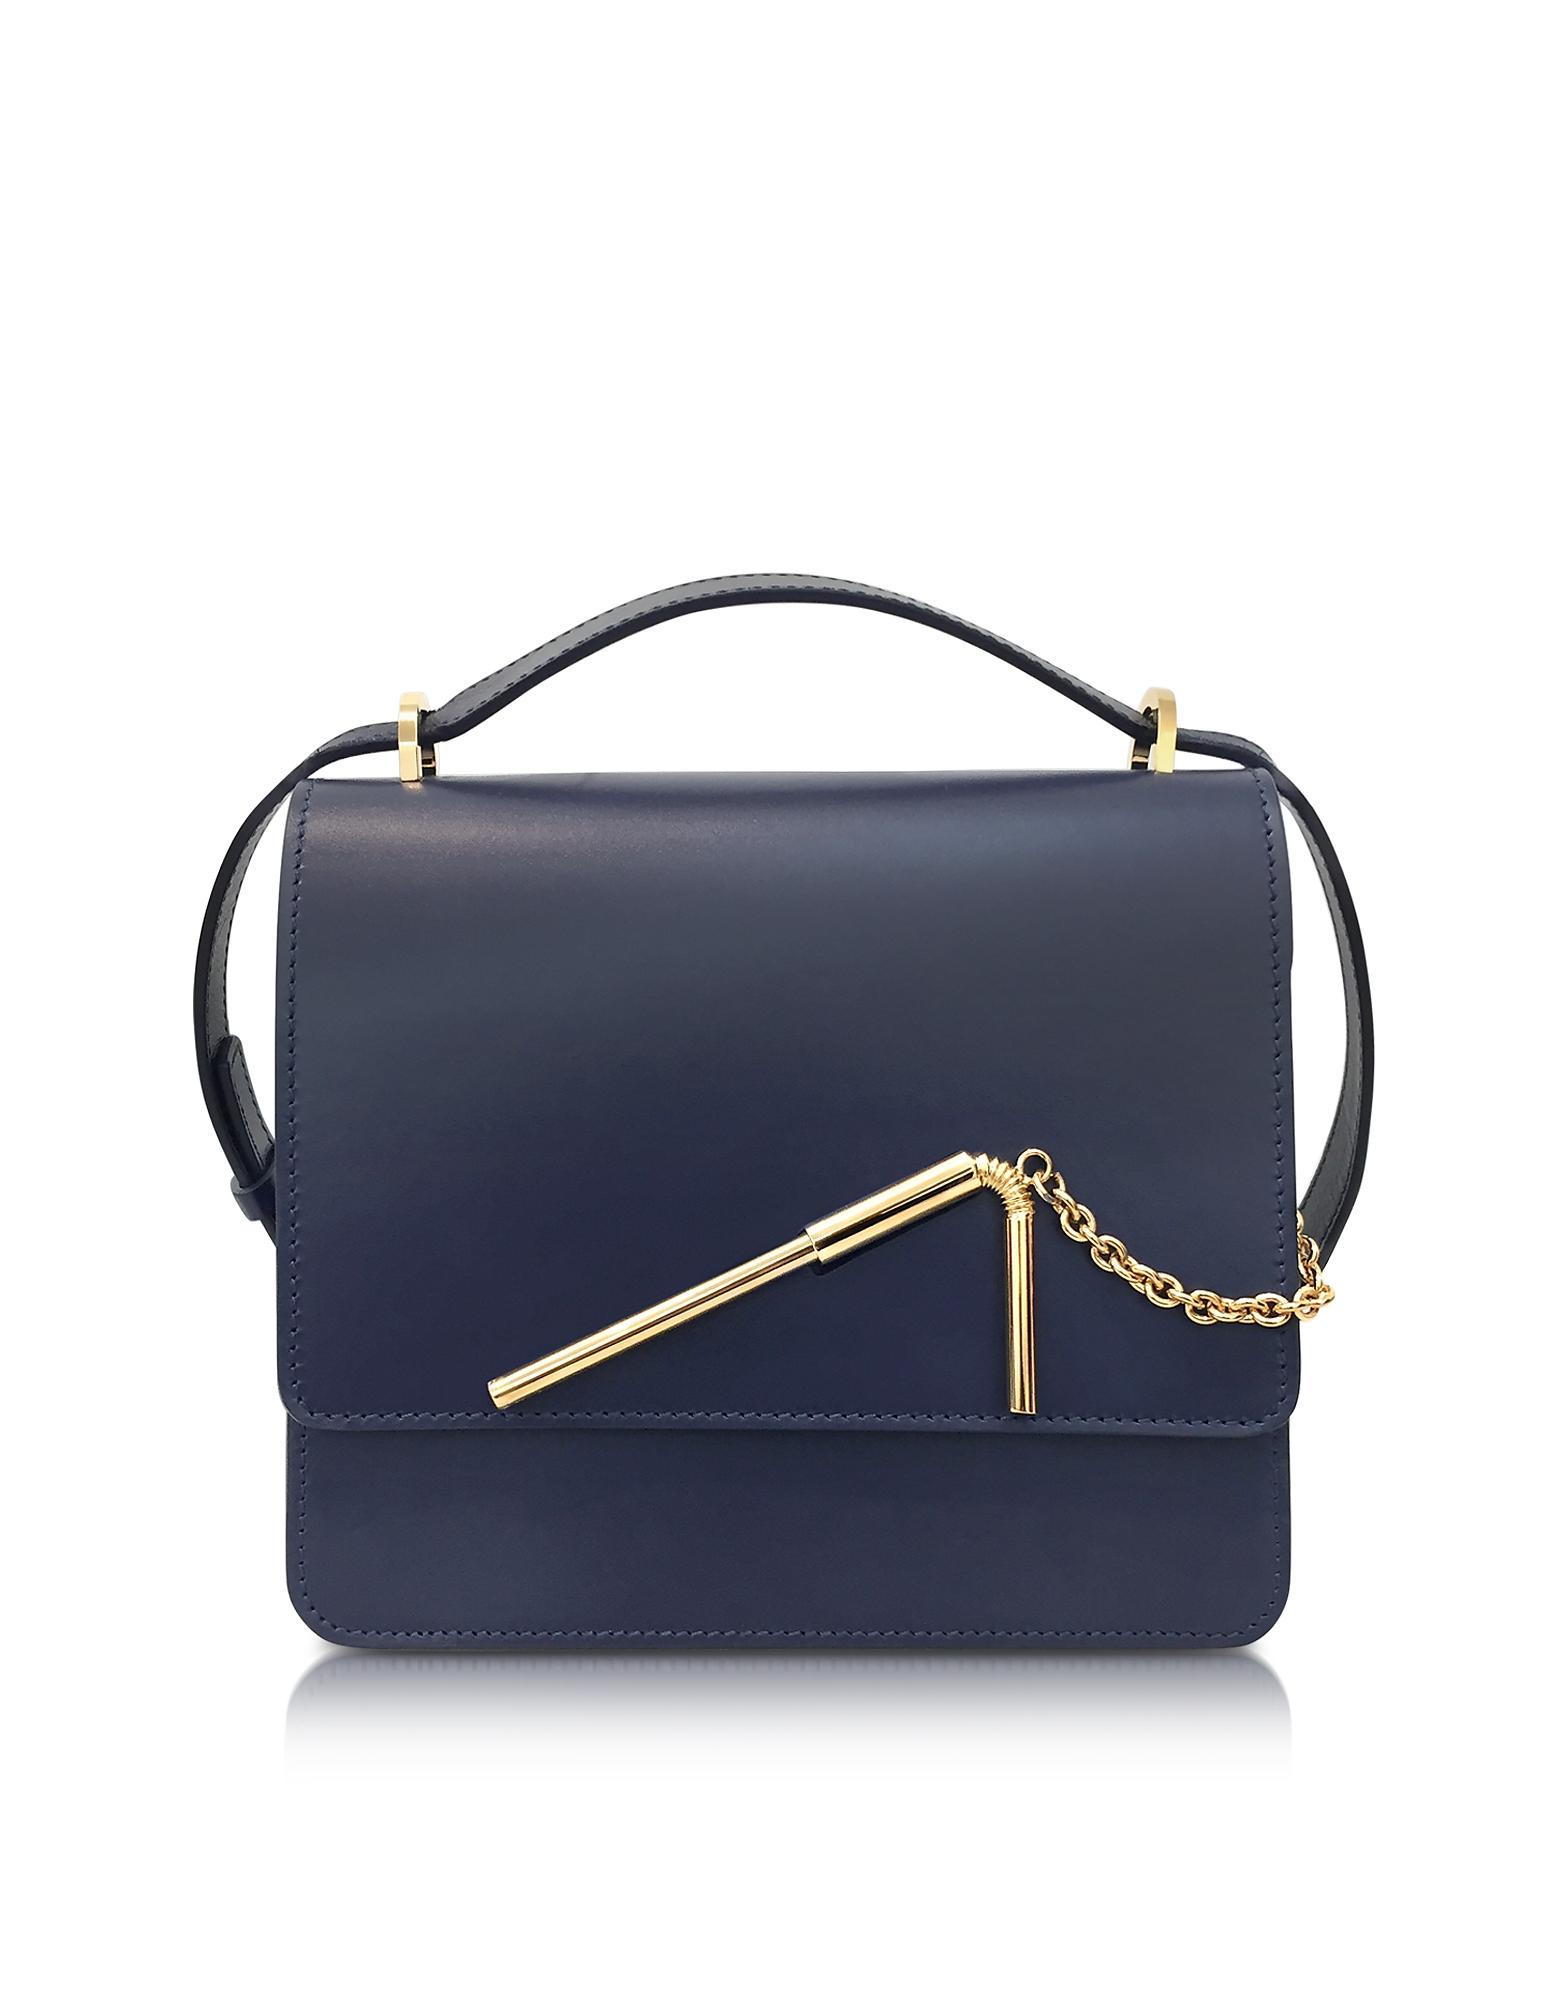 Sophie Hulme Deep Navy Medium Straw Bag